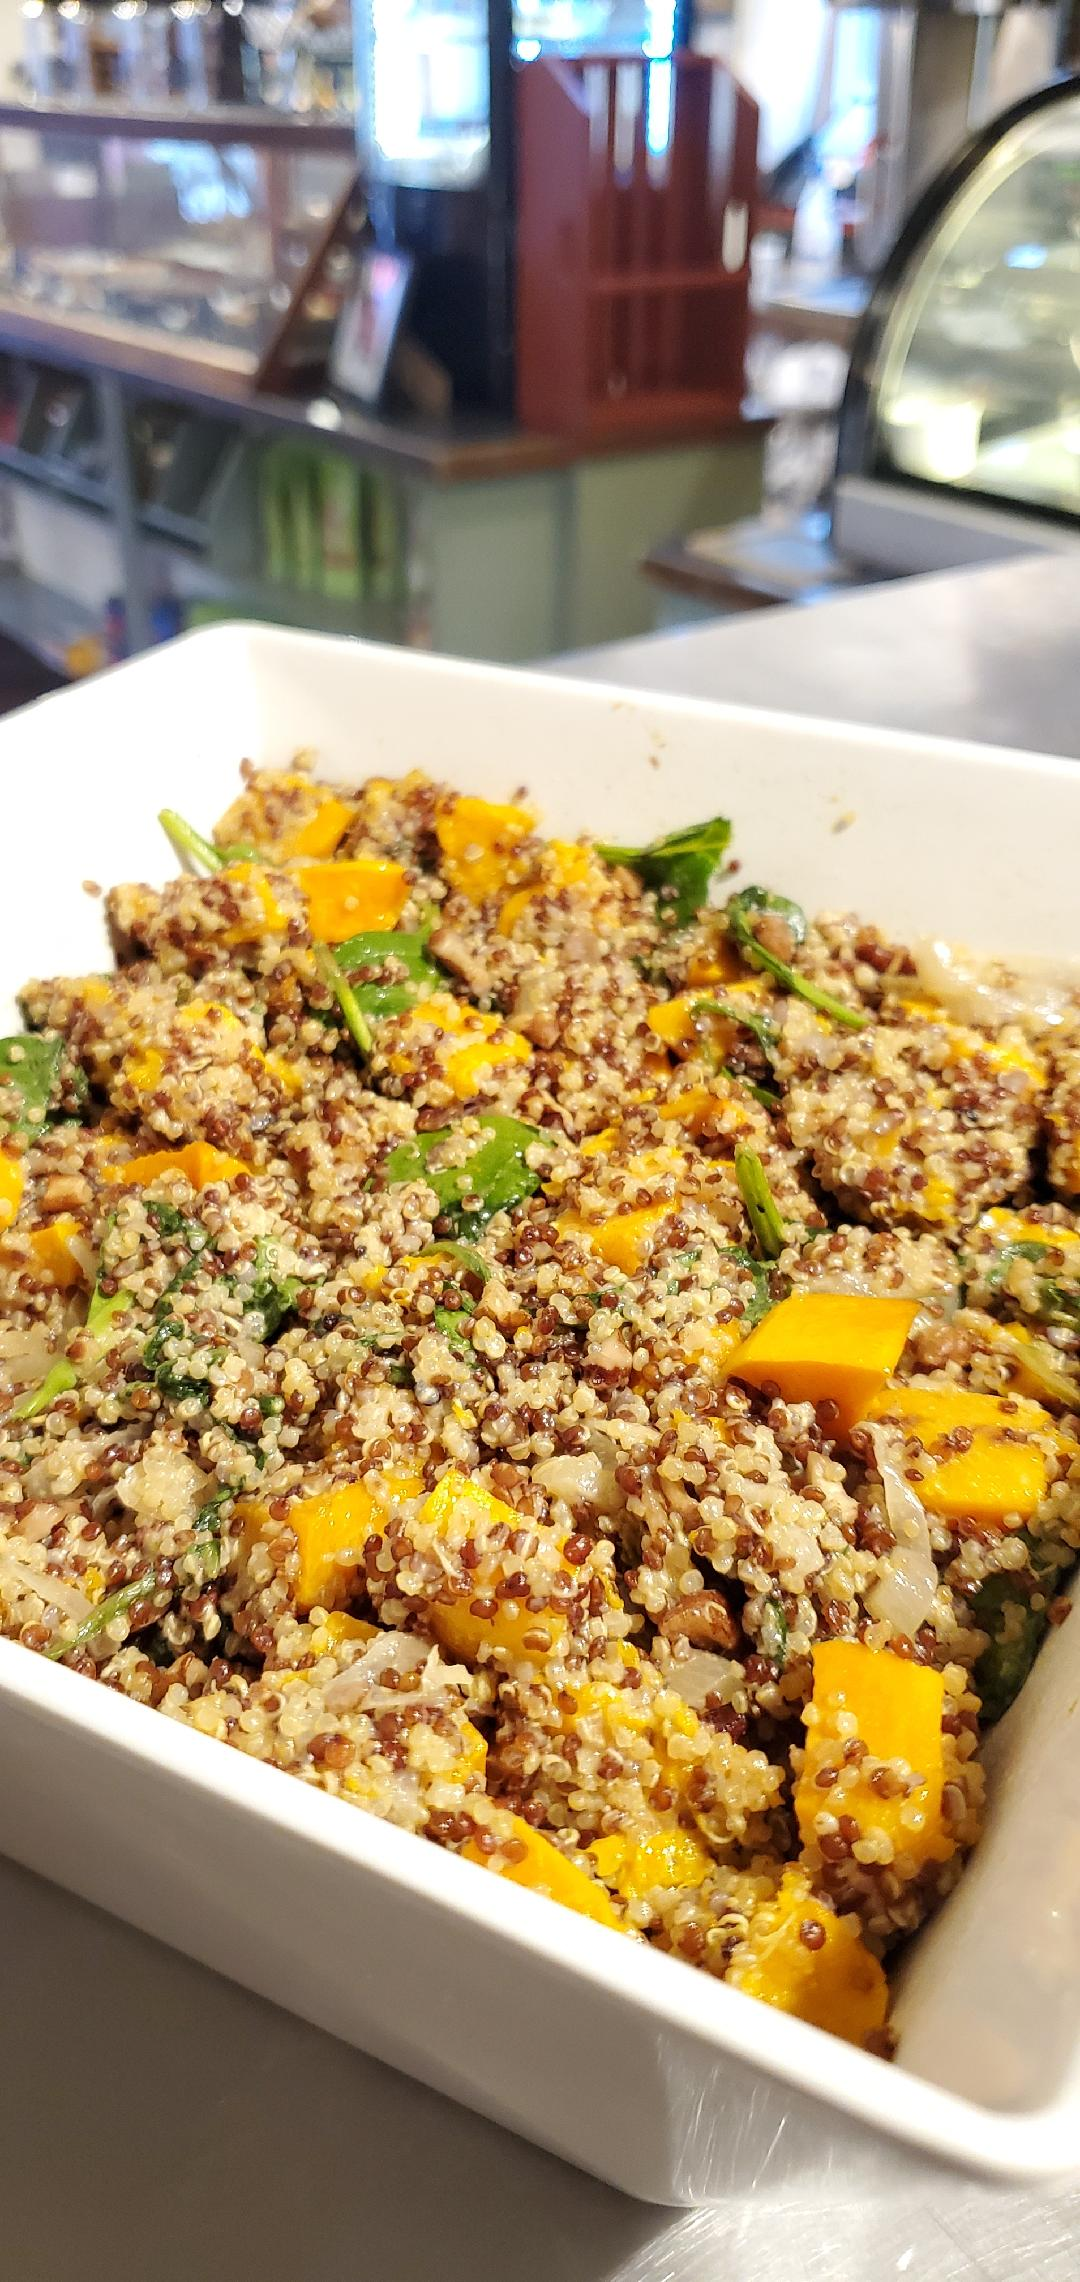 Far Land Provisions Quinoa Butternut Squash Salad